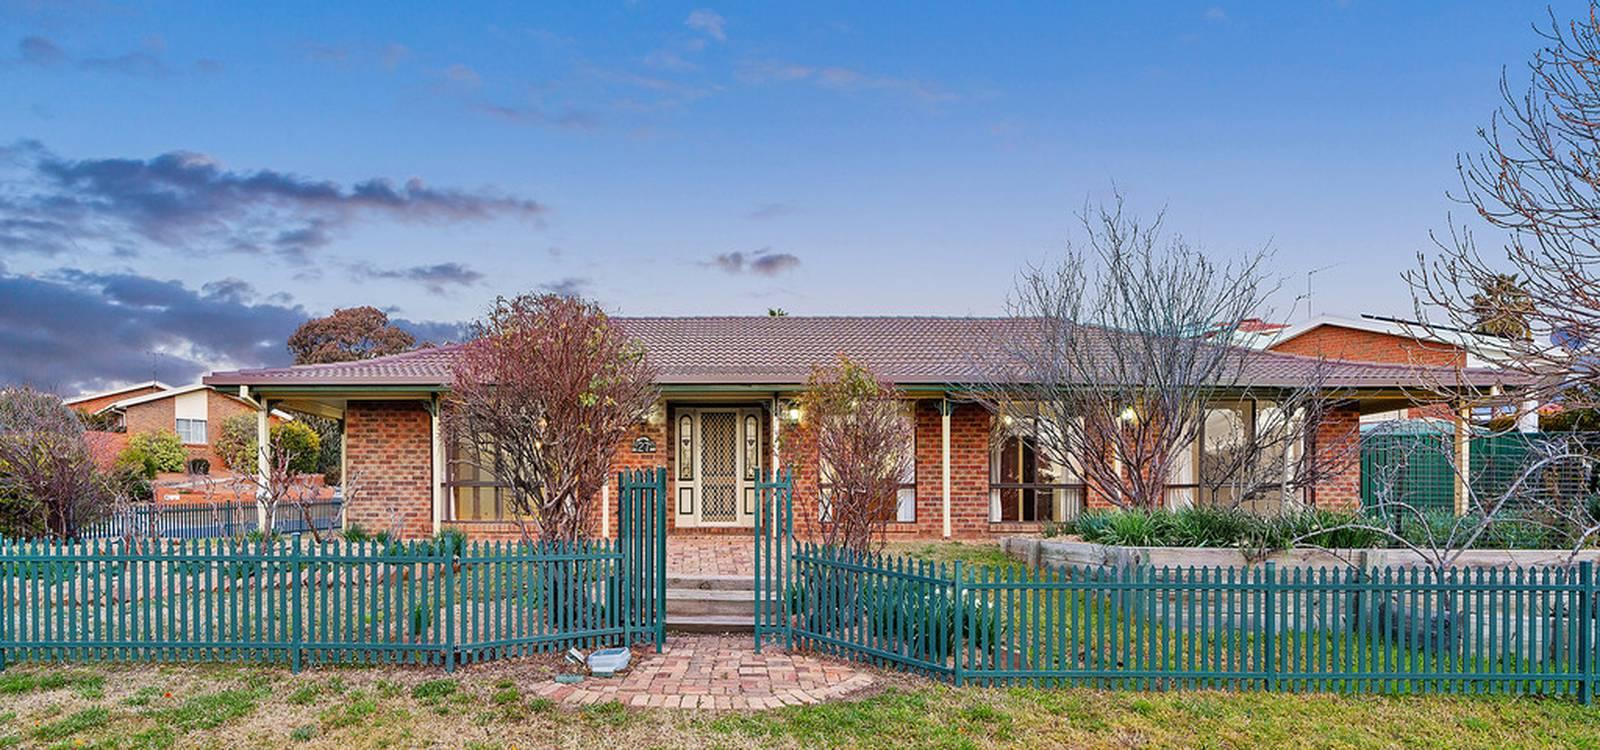 27 Rusten Street KARABAR, NSW 2620 - photo 1